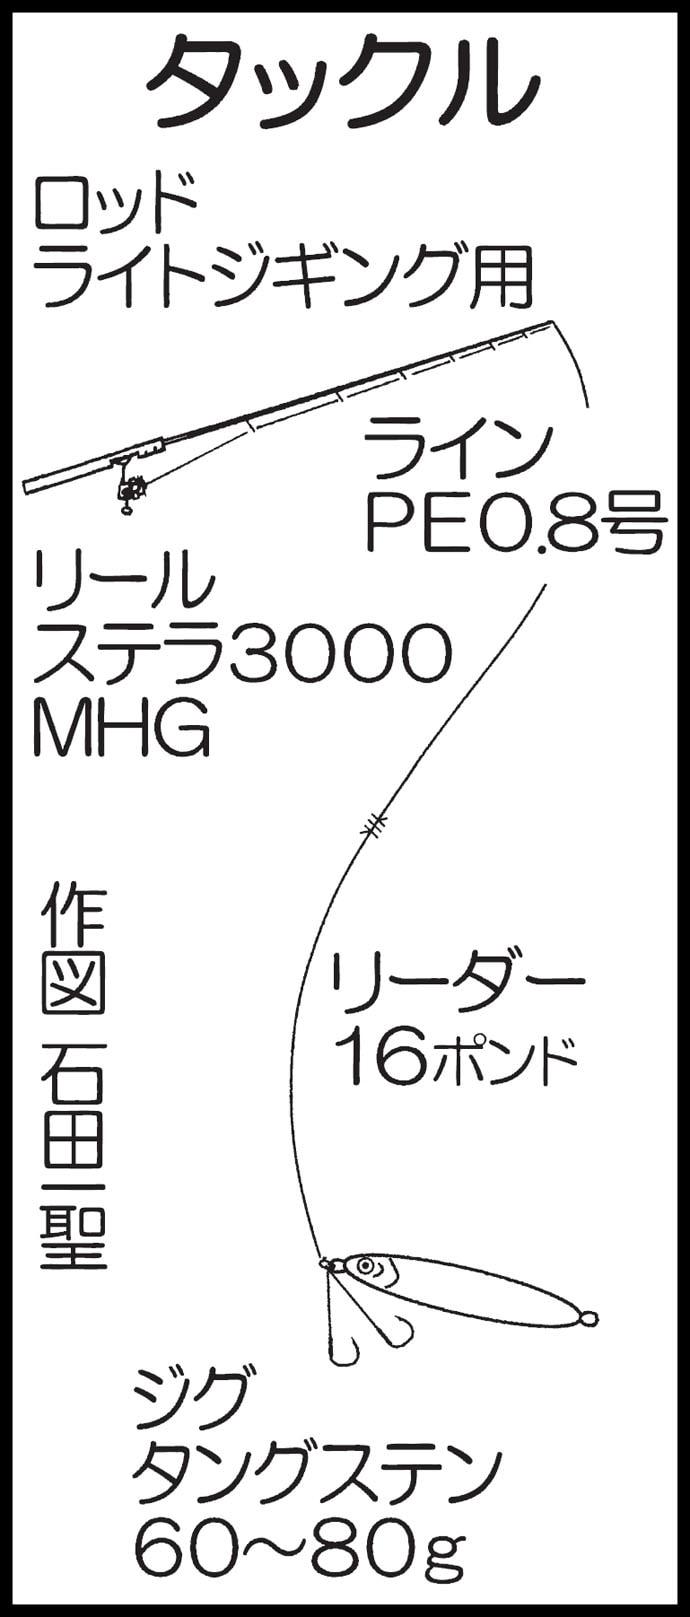 SLJで50cmイサキ 大型オオモンハタも【大分県・ブルーホーク】